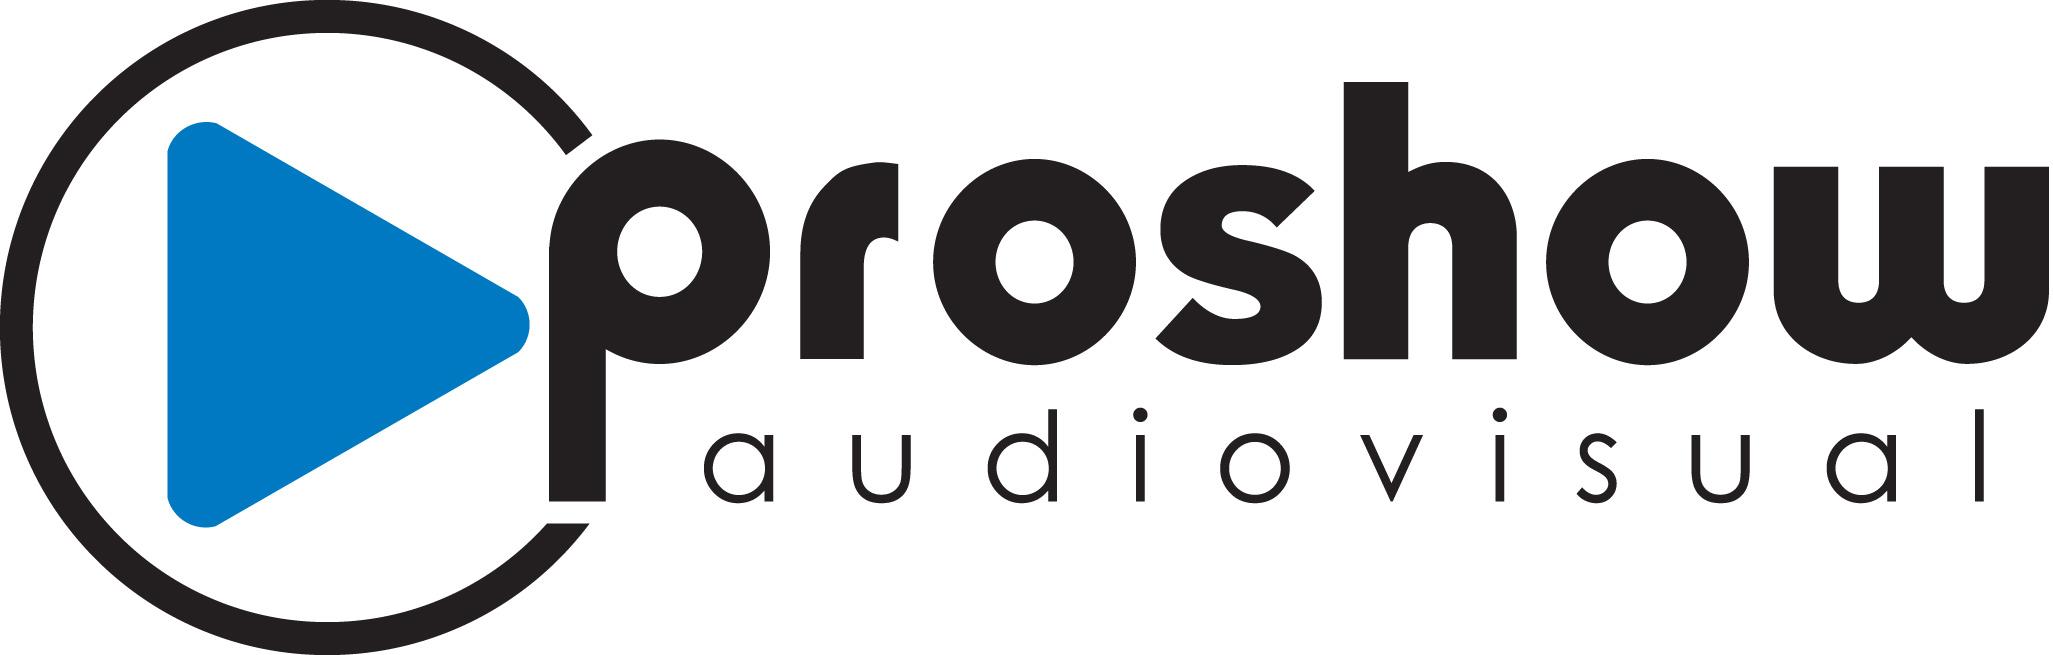 proshow audiovisual.jpg